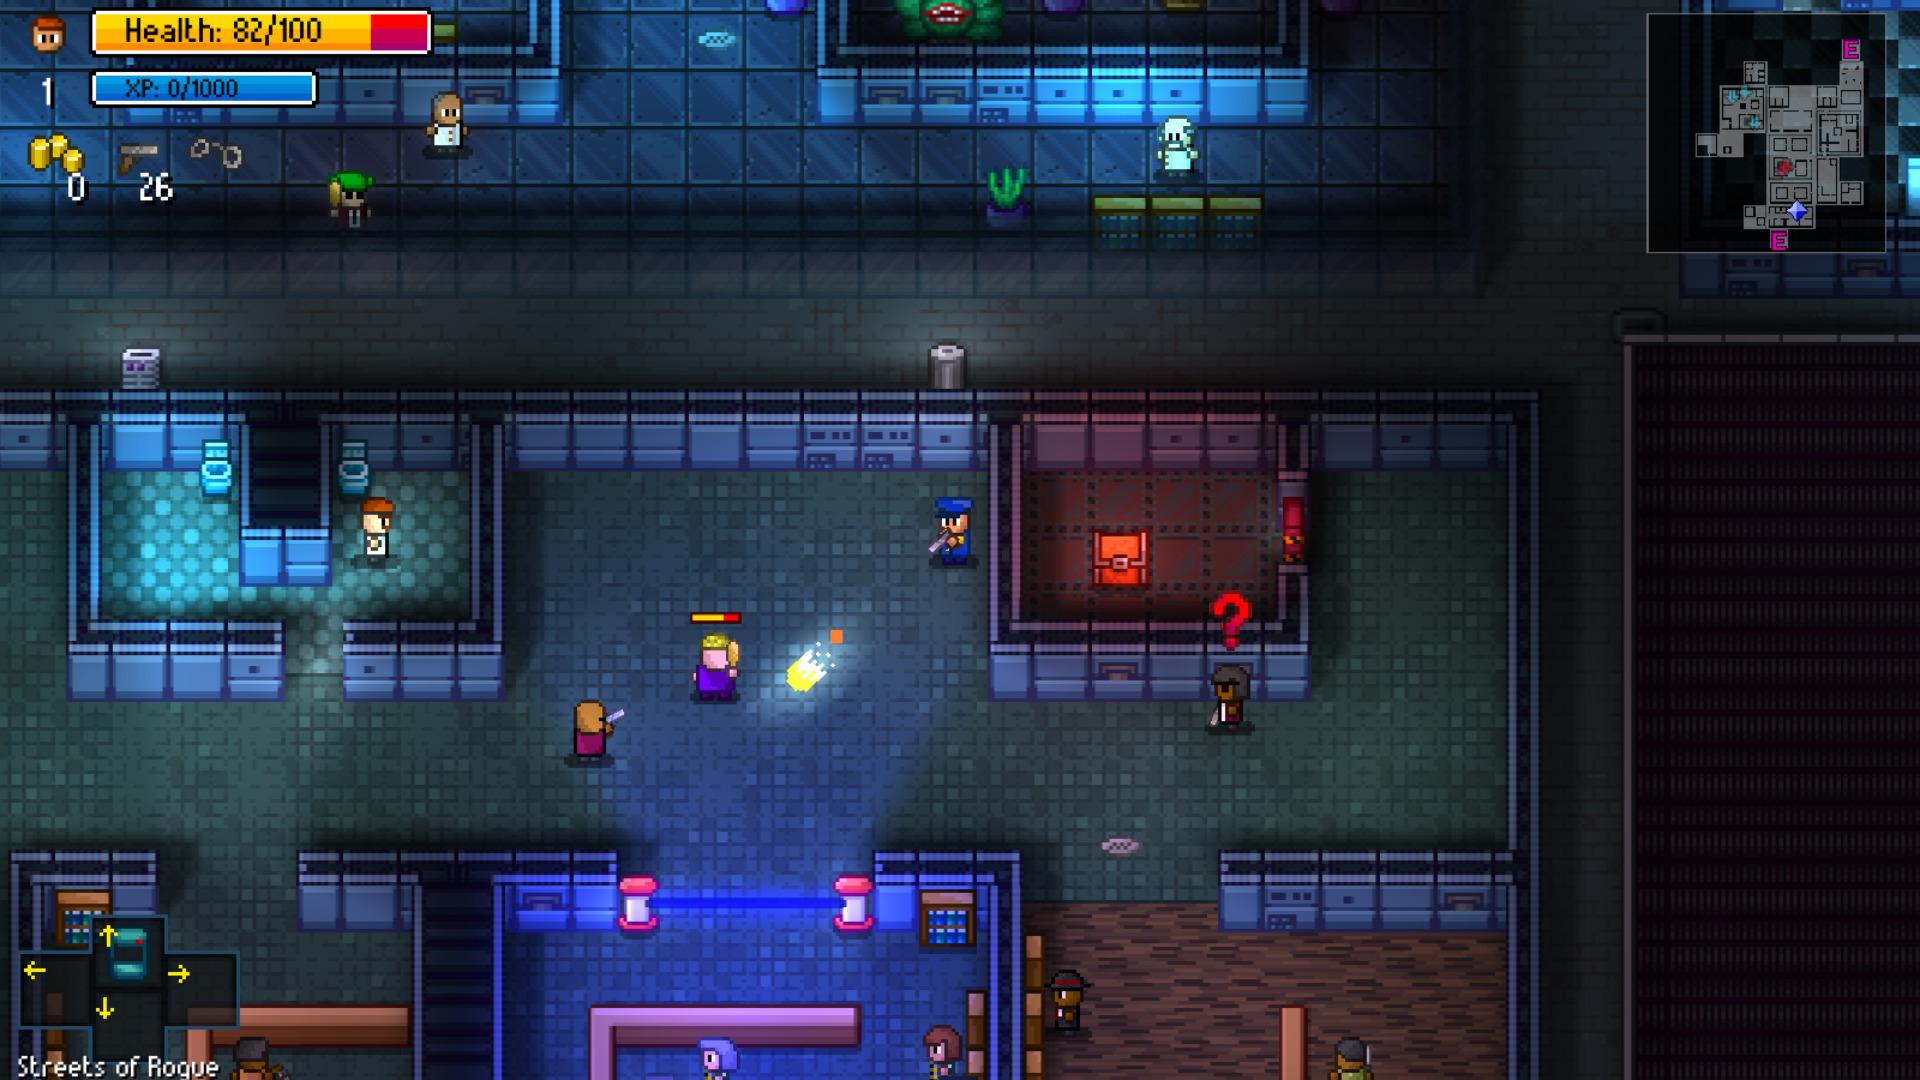 streets-of-rogue-pc-screenshot-04